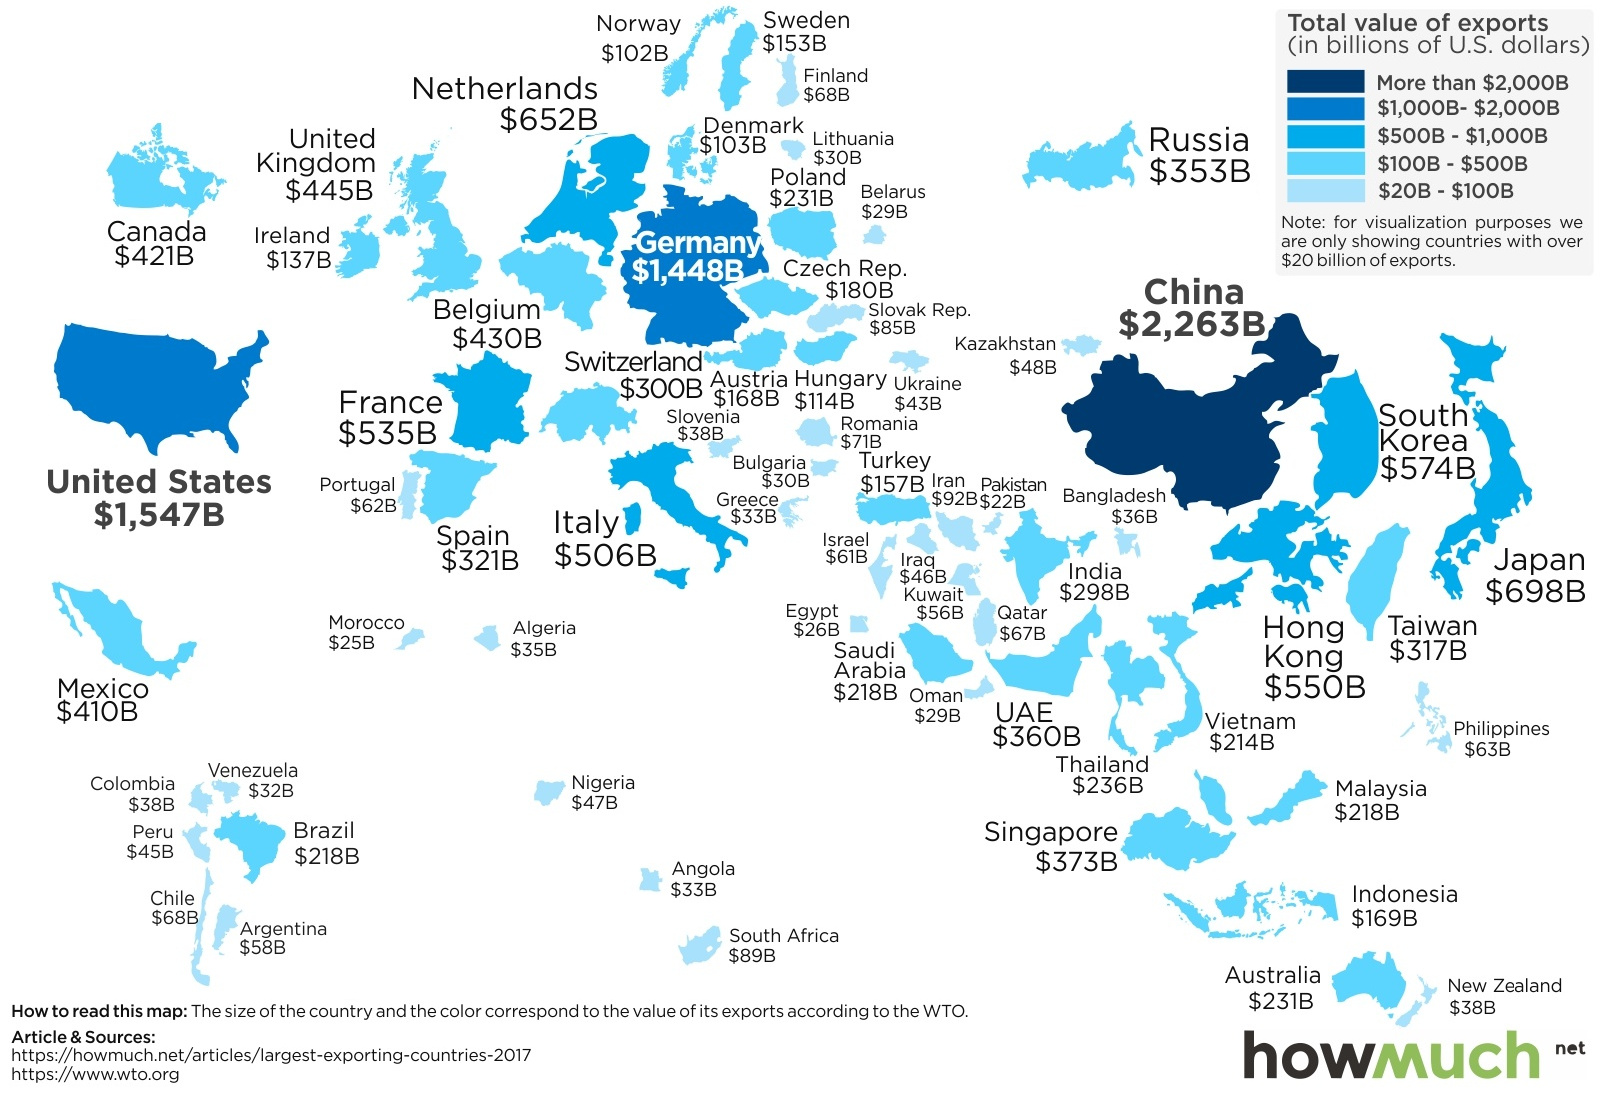 The World's Biggest Exporters in 2017